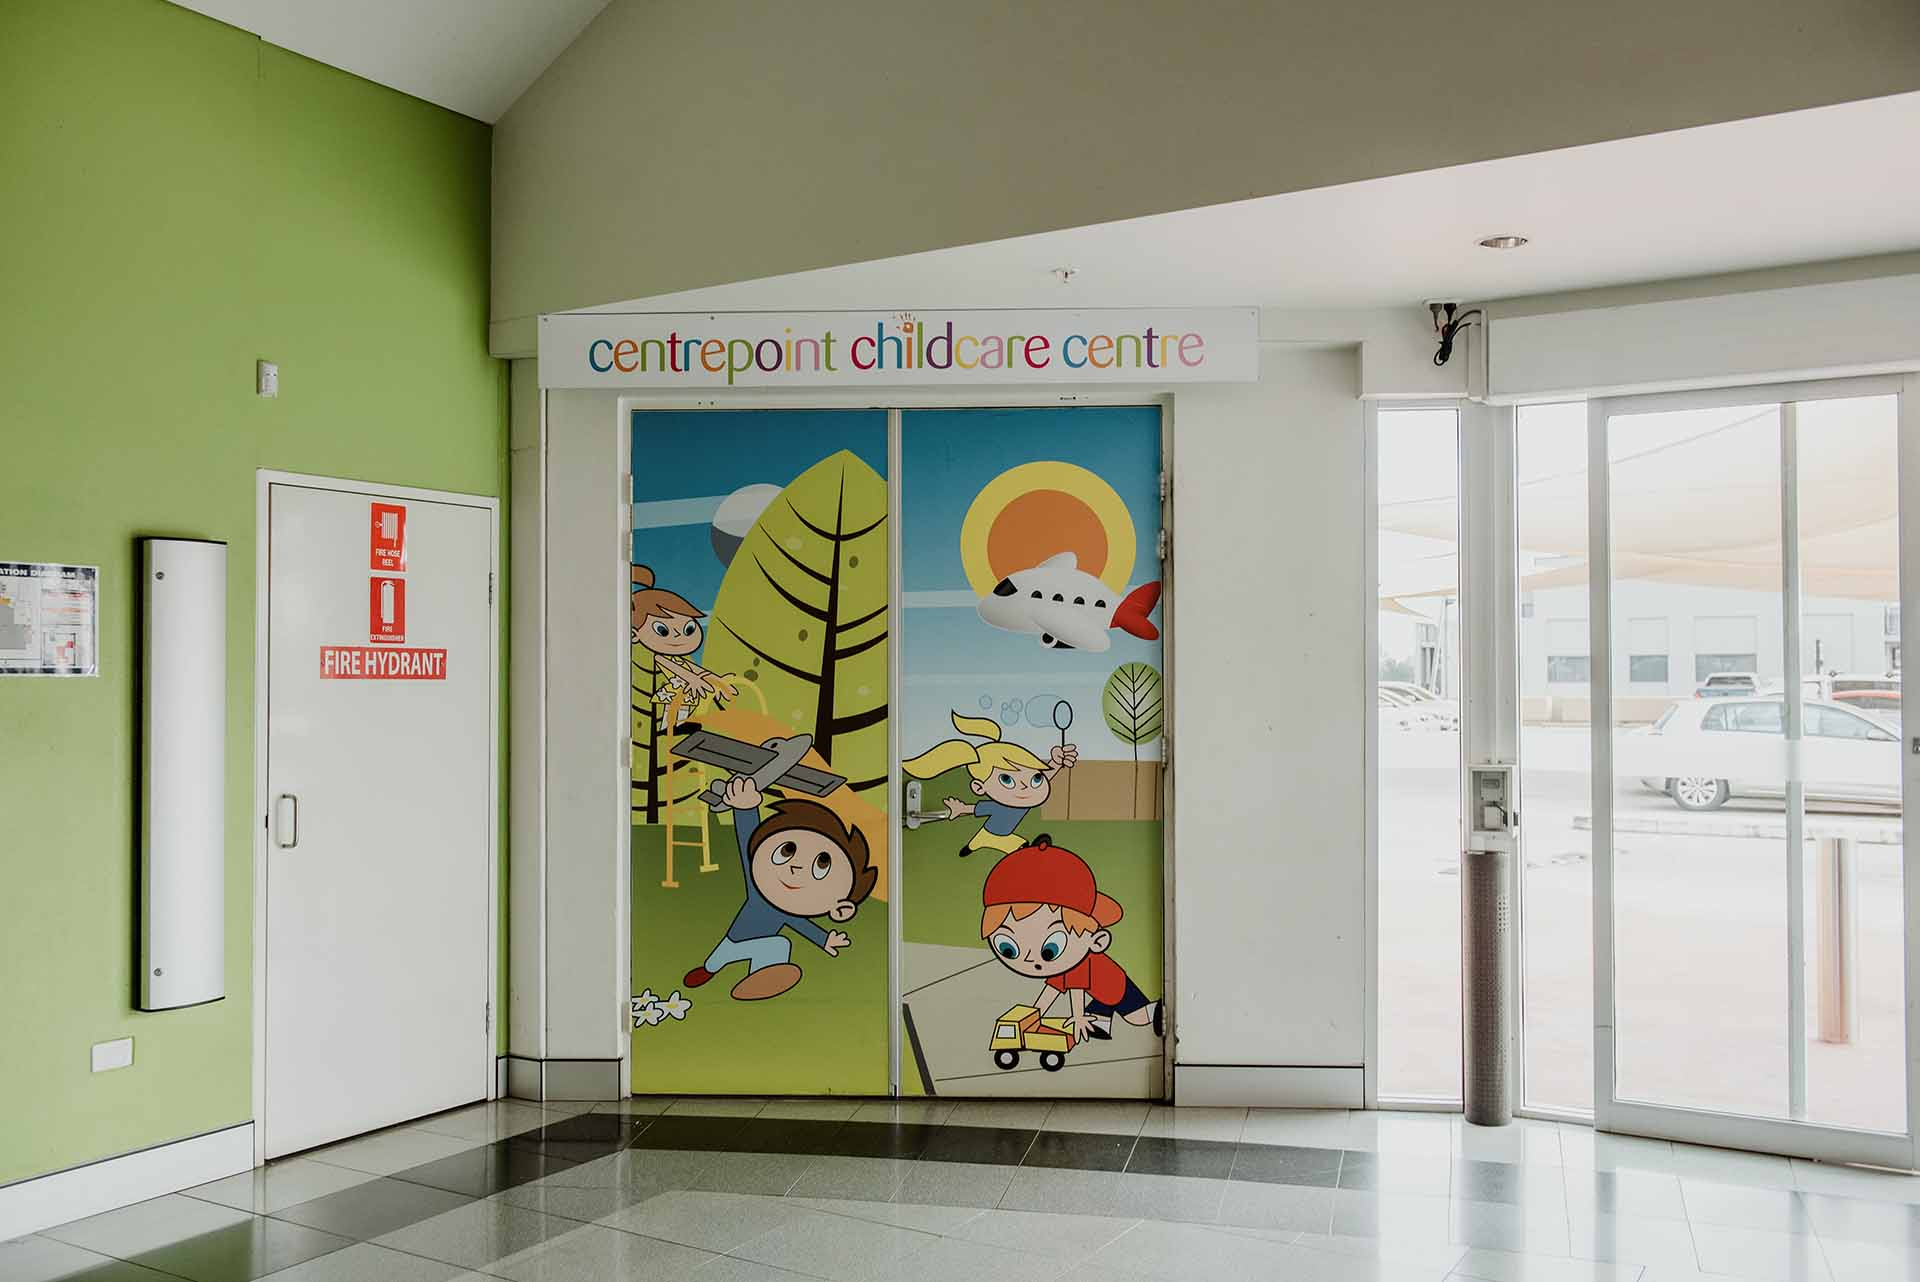 centrepoint childcare centre